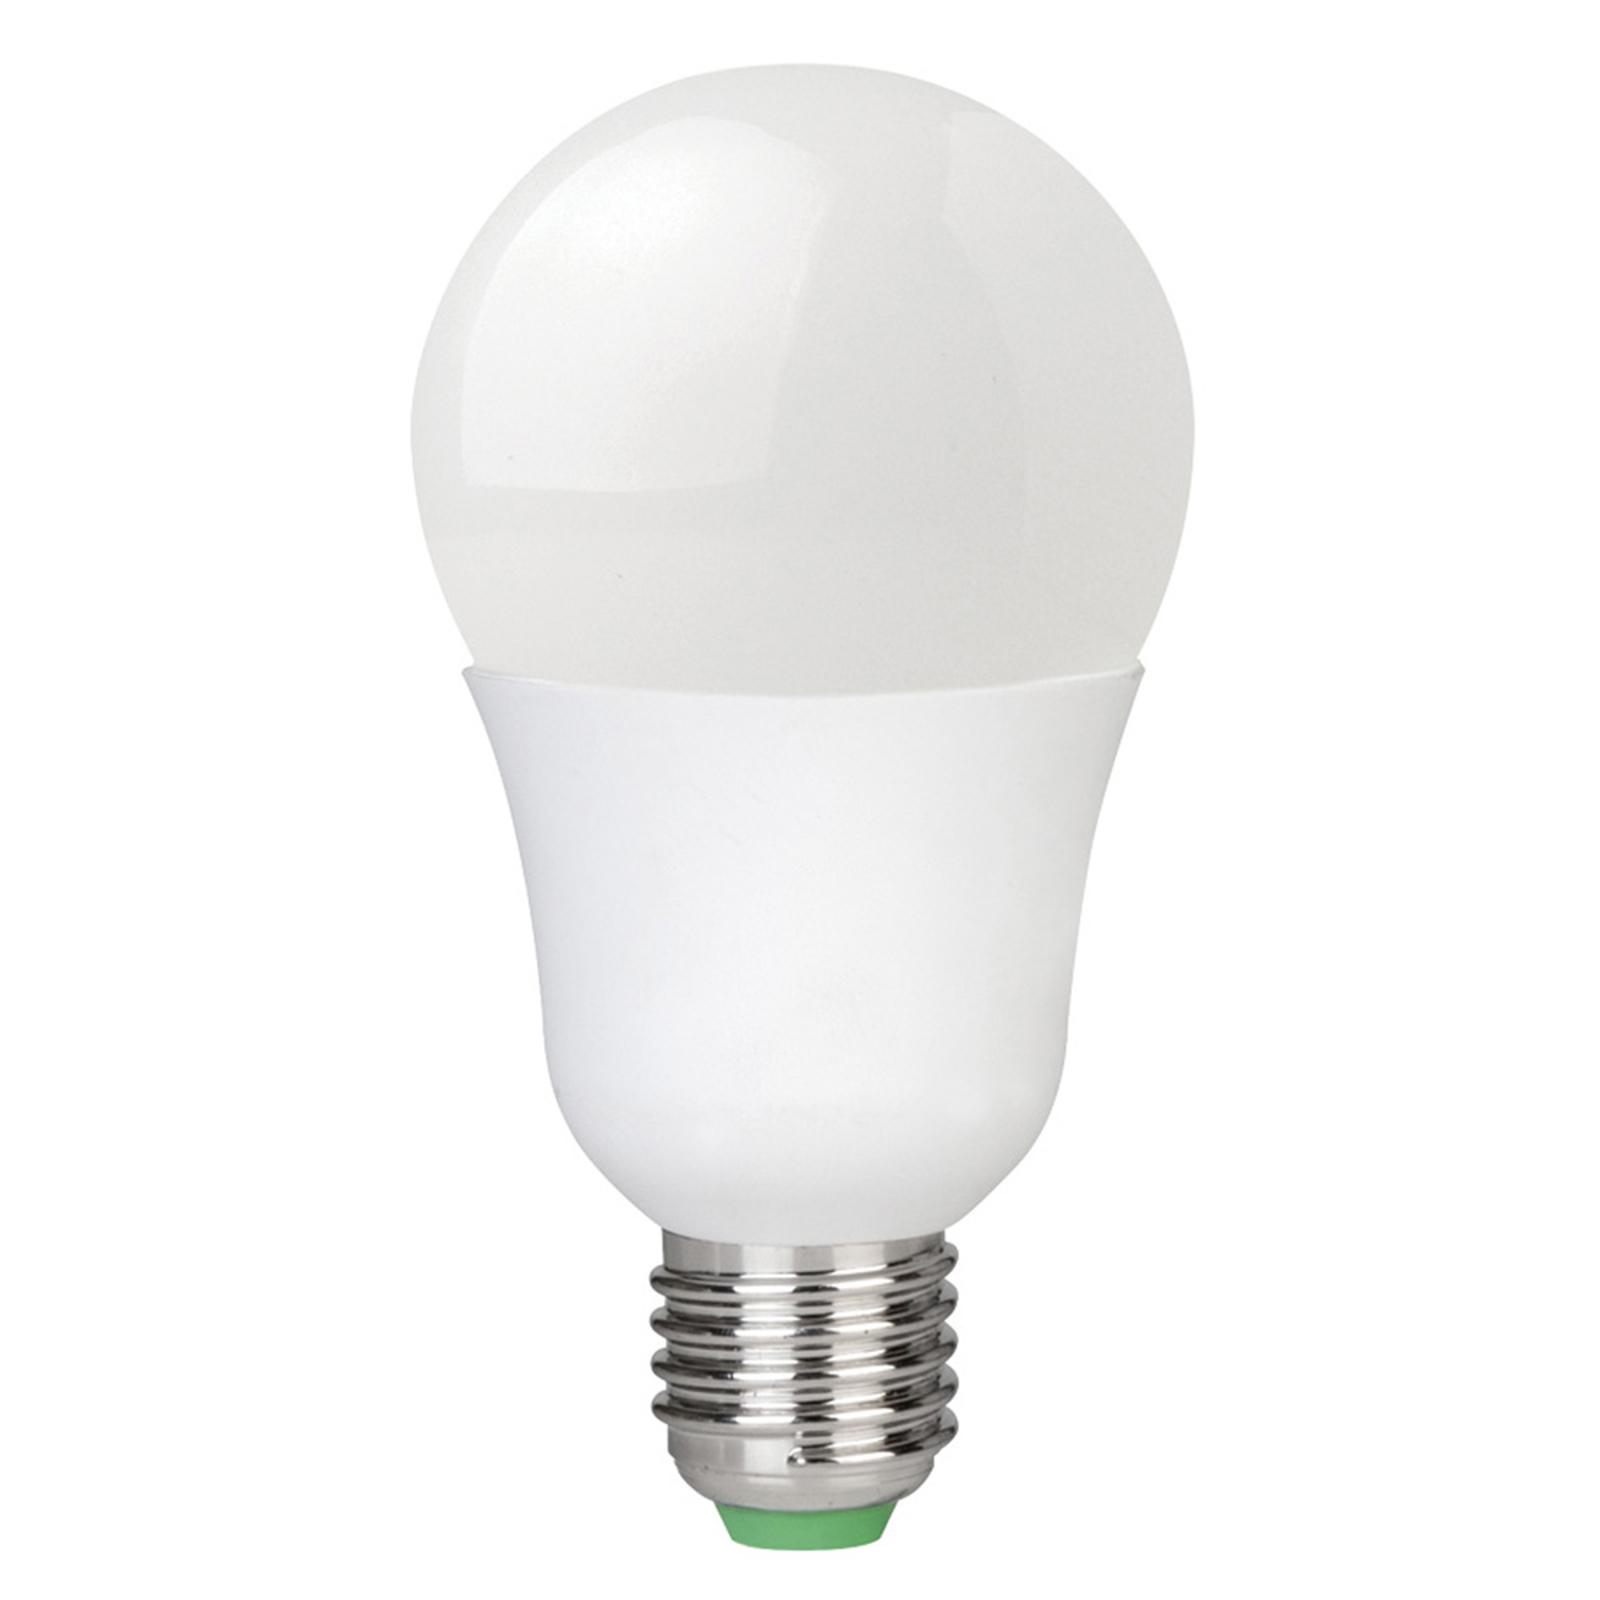 E27 11 W 828 bombilla LED MEGAMAN Smart Lighting